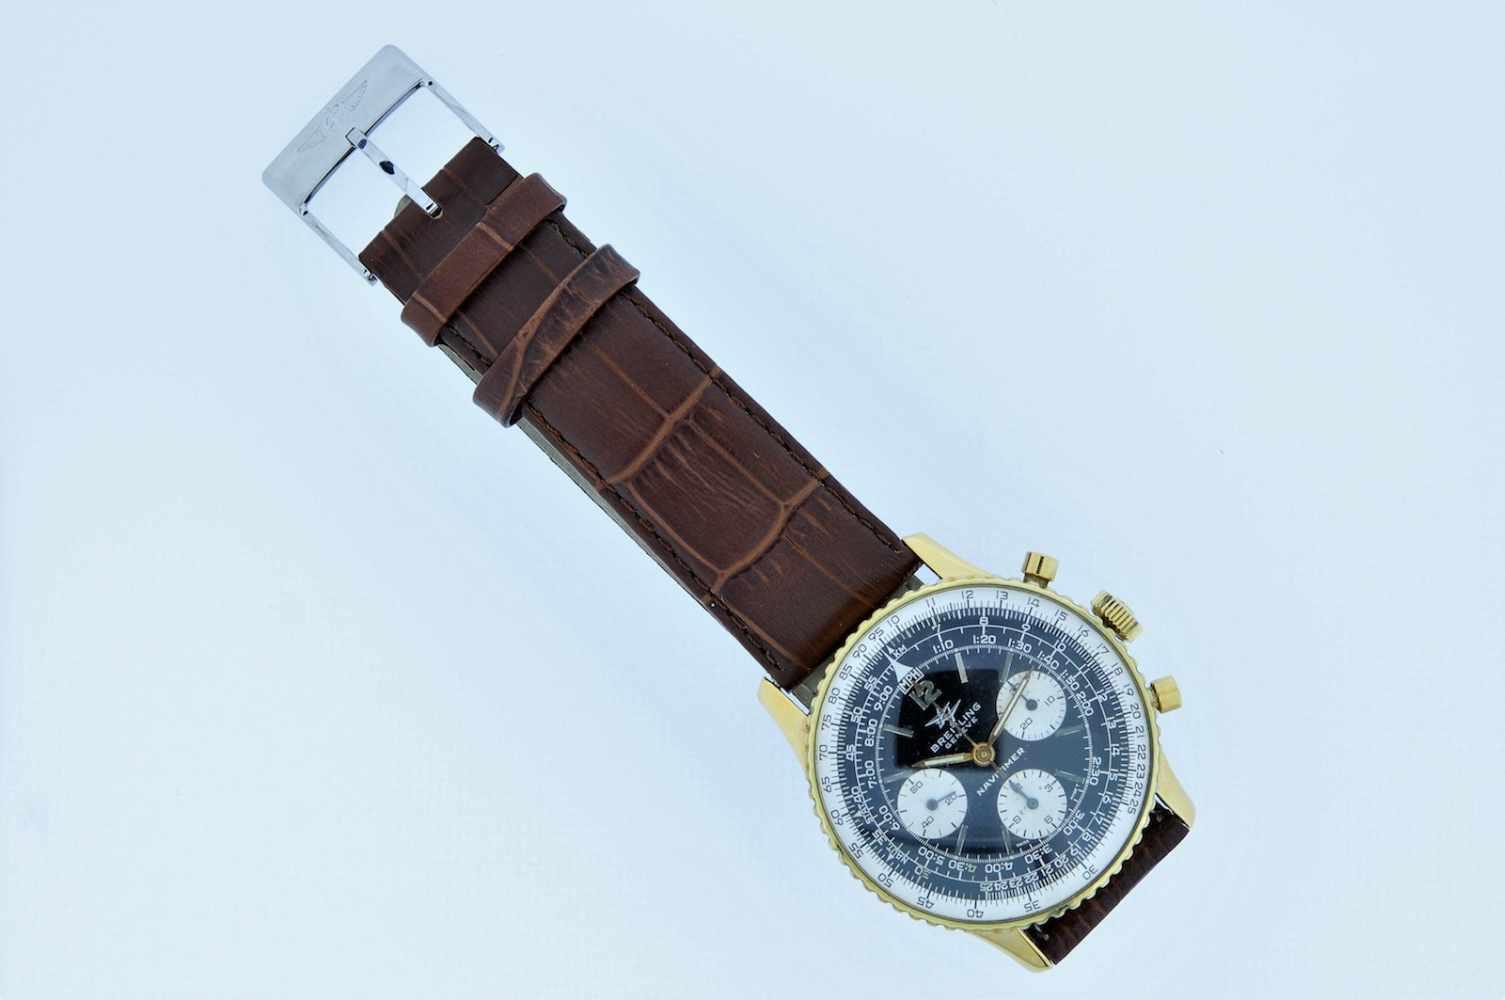 Breitling Stahl vergoldete Armbanduhr an Lederband, Breitling Navitimer, Fliegerchronograph, - Bild 3 aus 5